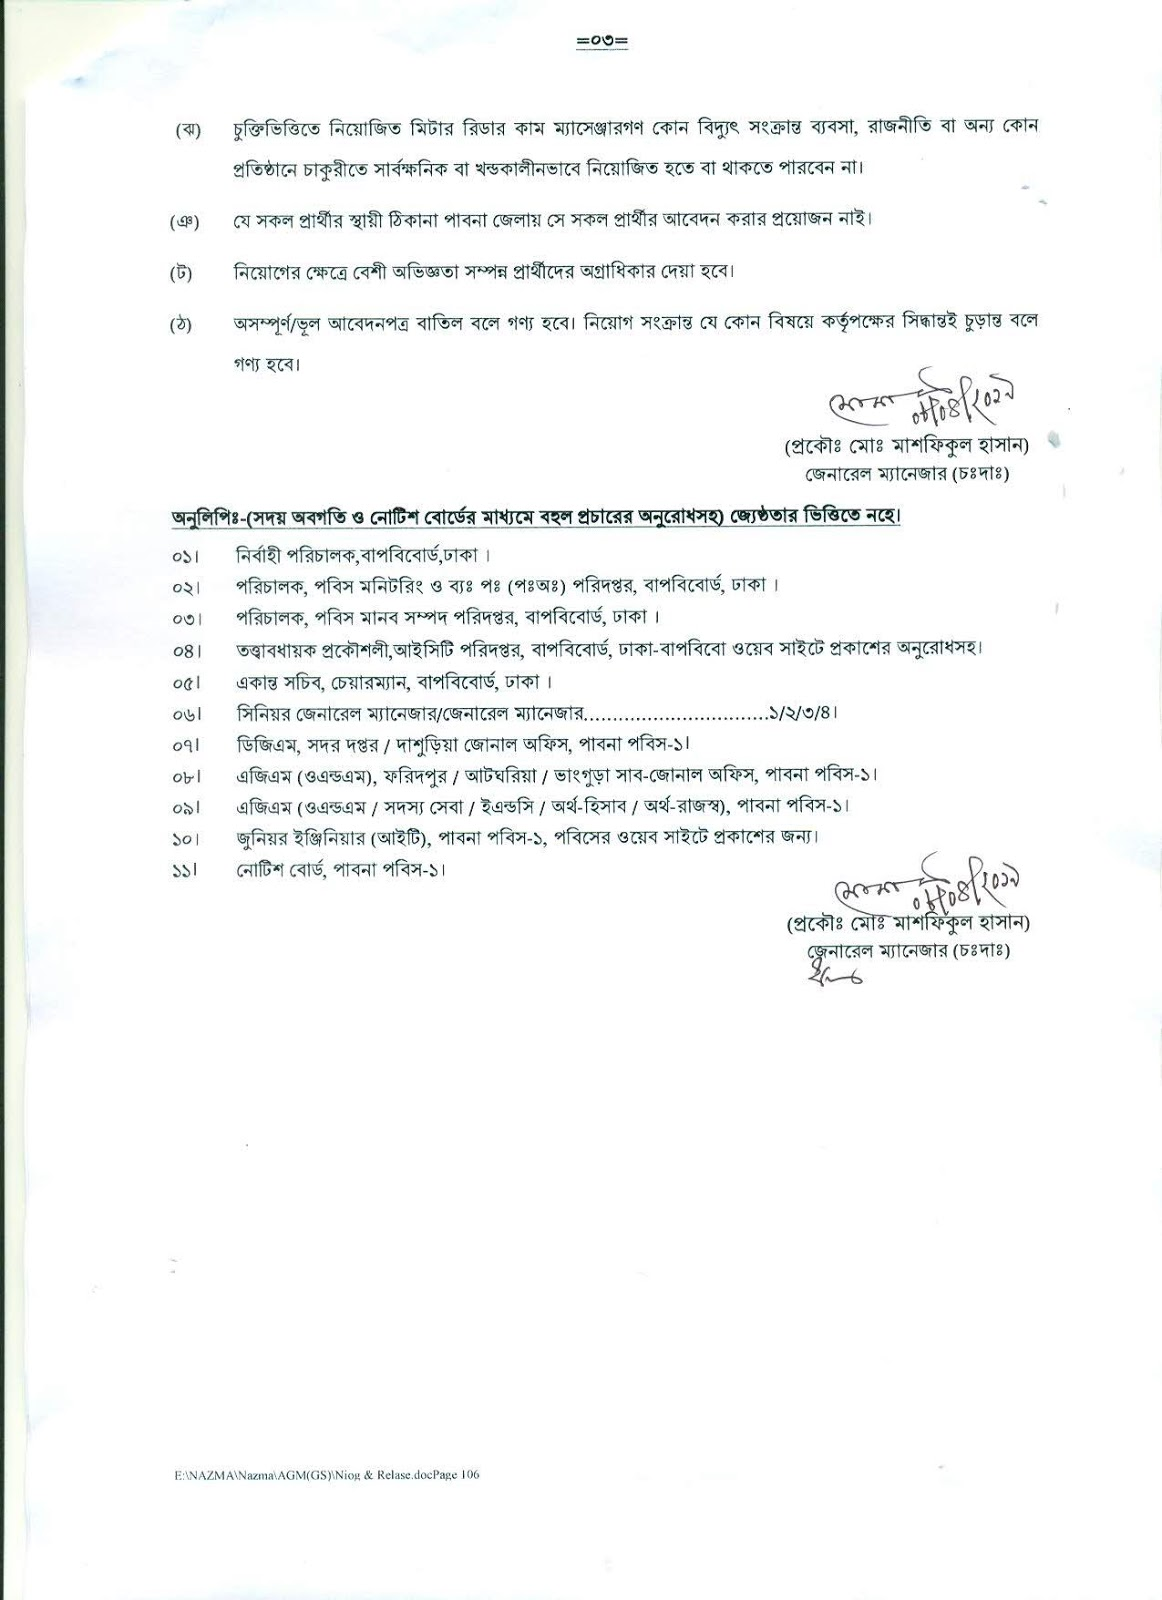 Pabna Palli Bidyut Samity Published Job Circular